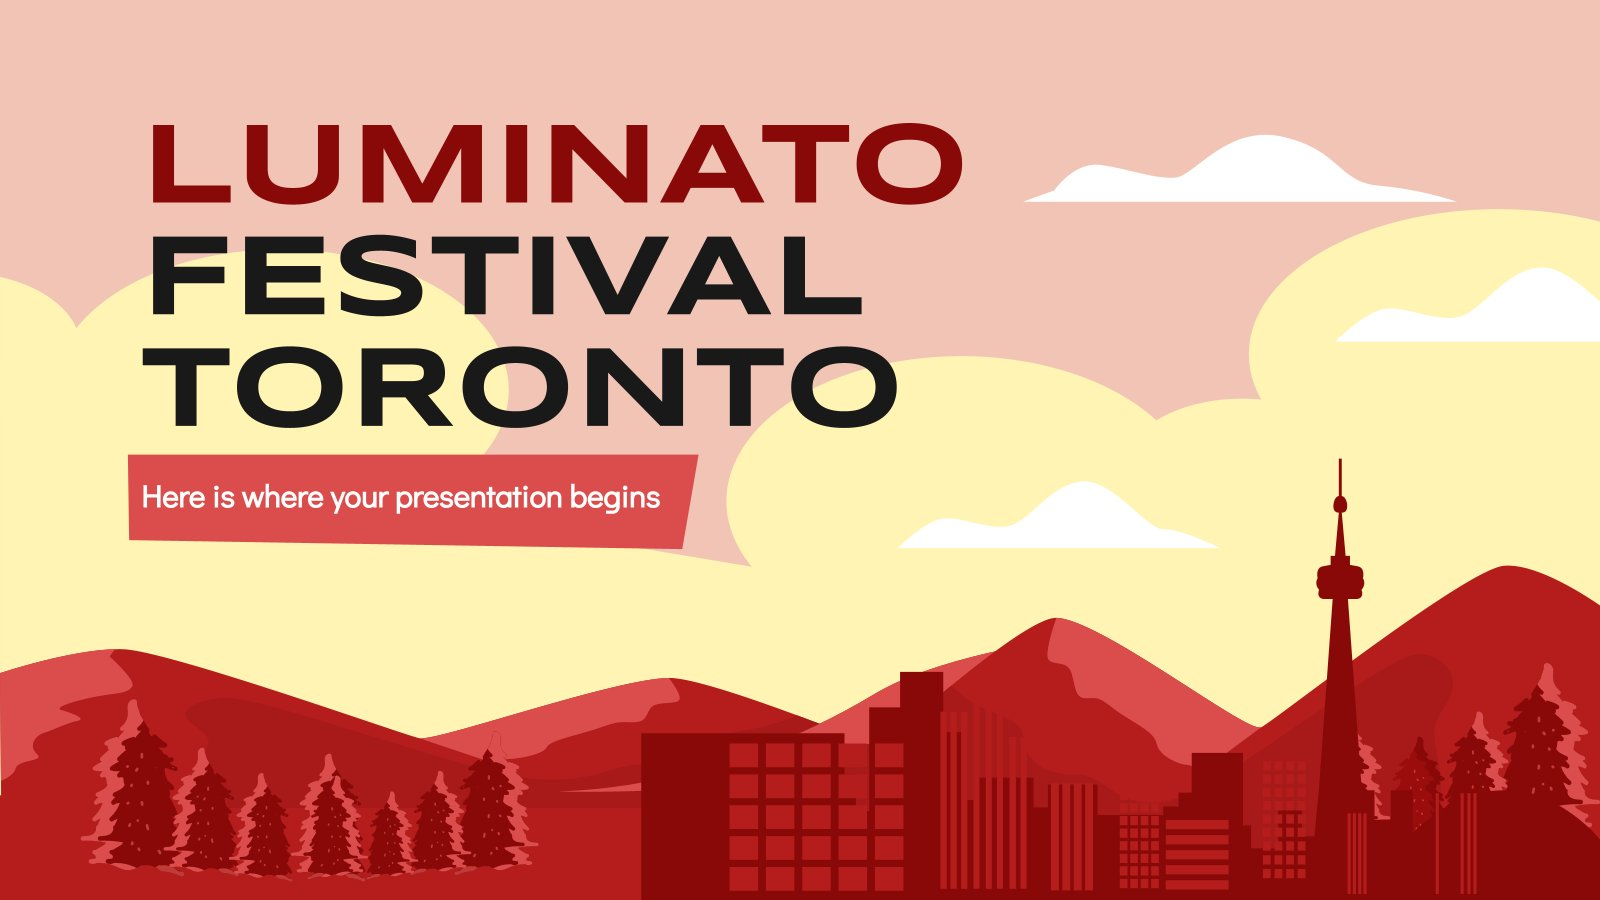 Luminato Festival Toronto presentation template